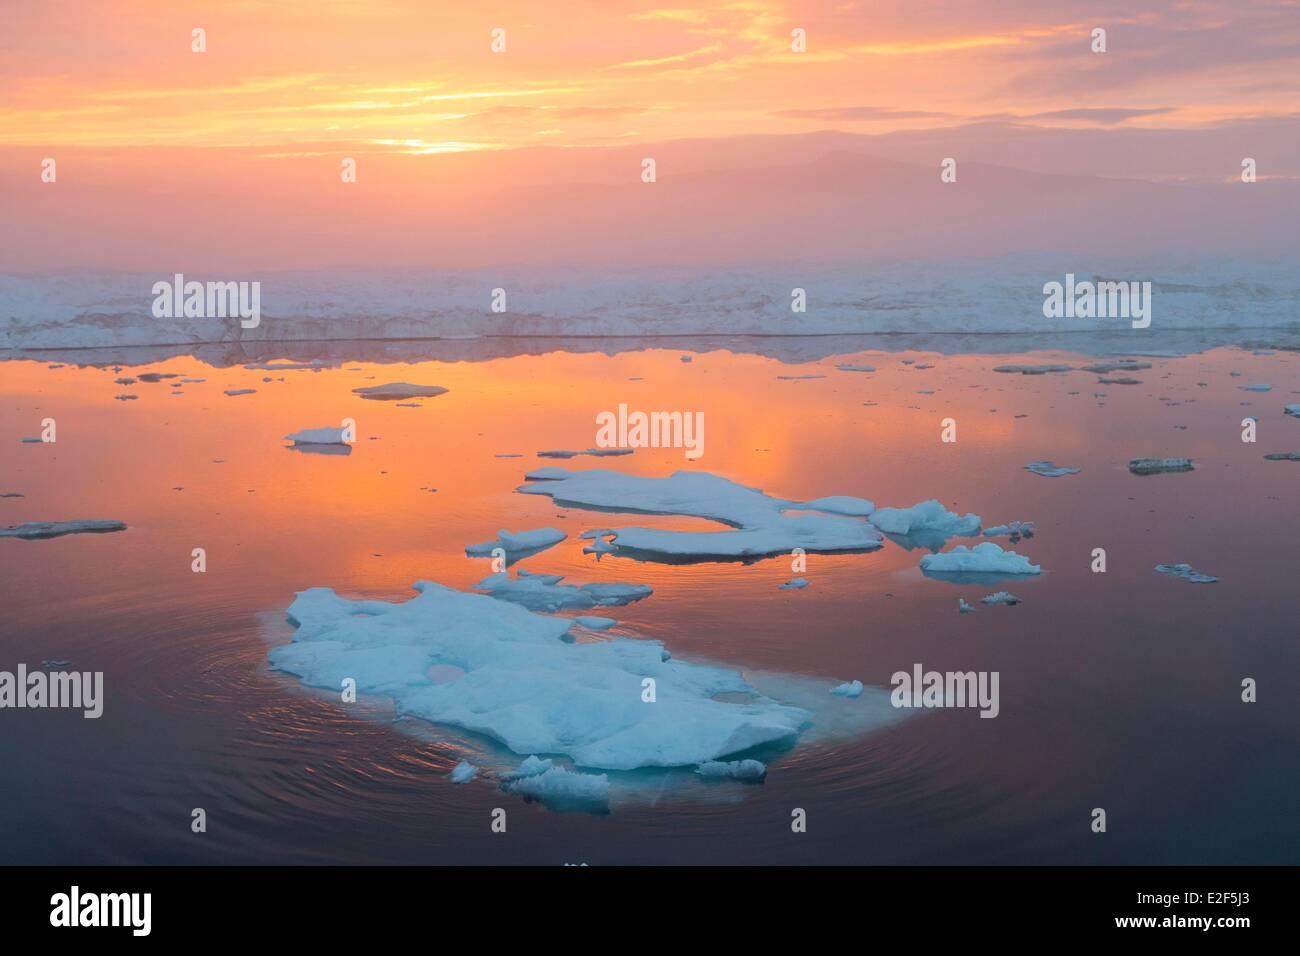 Russia, Chukotka autonomous district, Wrangel island, Pack ice at sunset Stock Photo